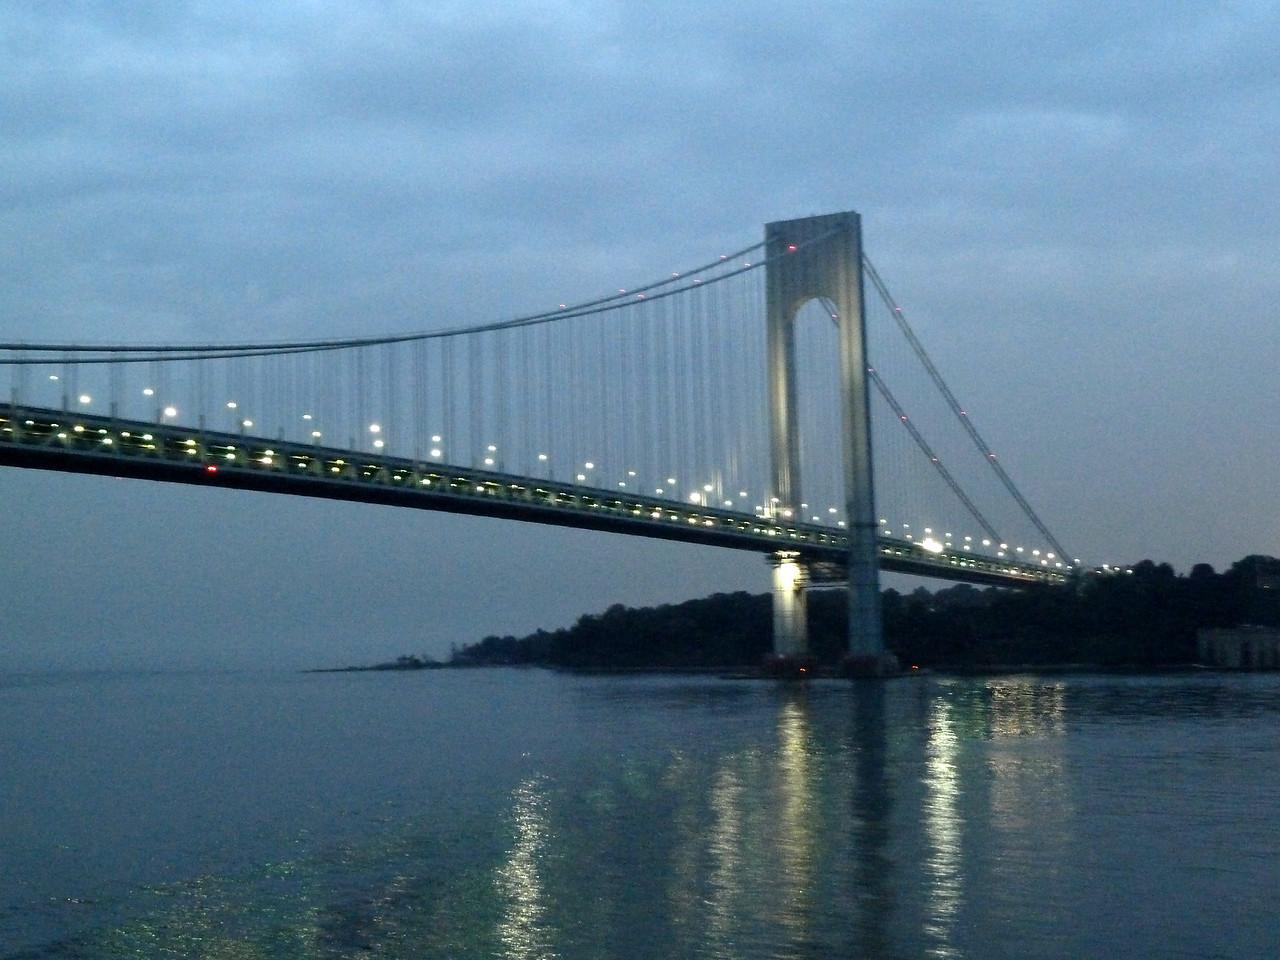 Verrazano-Narrows Bridge - New York Harbor